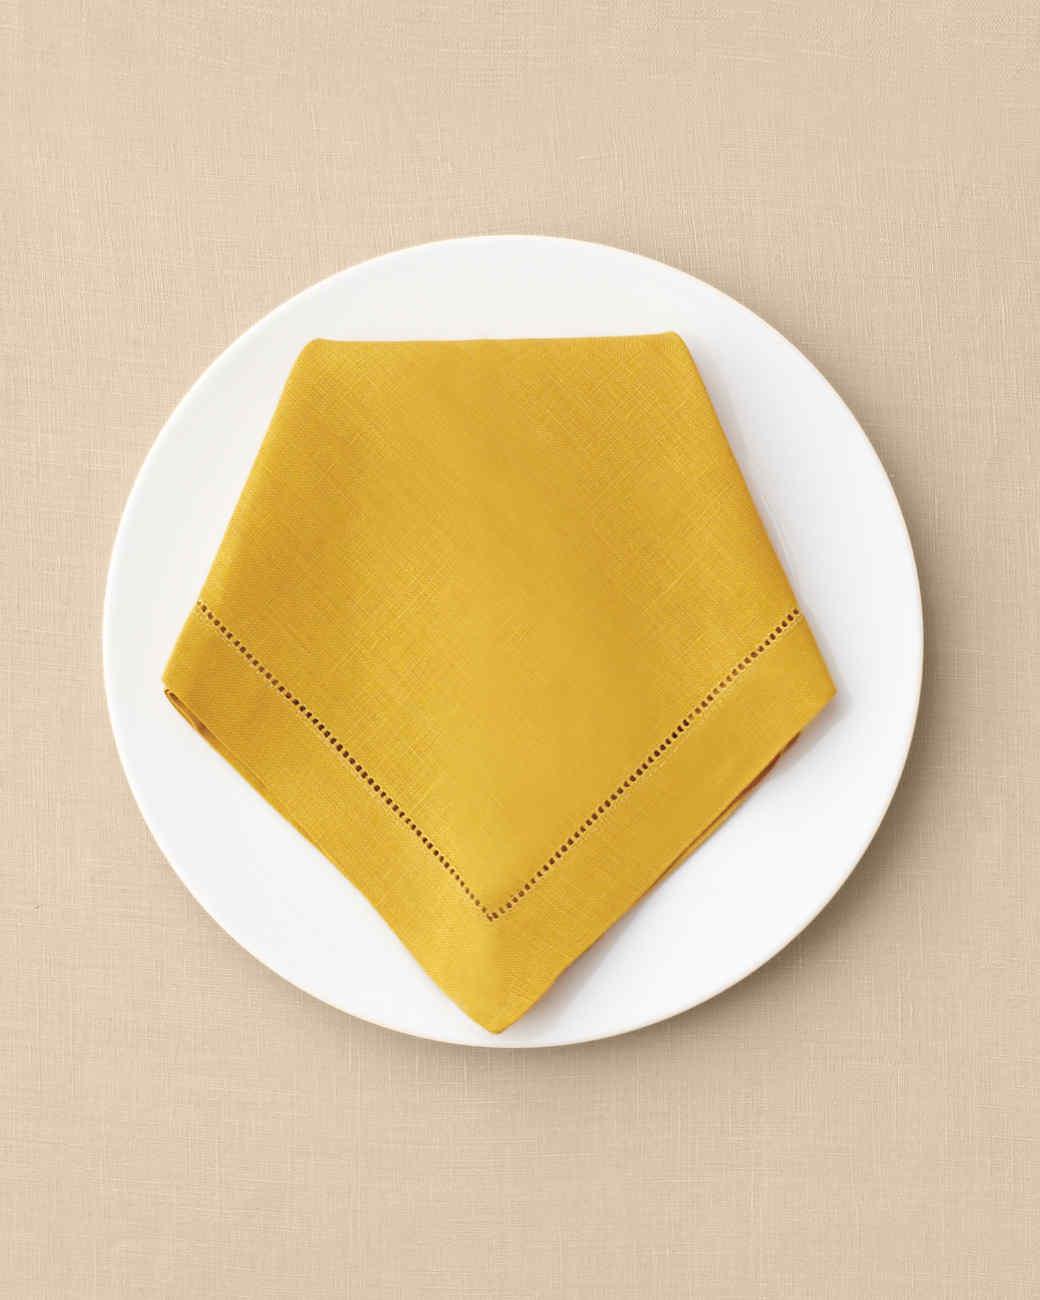 The Art Of Napkin Folding One Napkin 12 Ways Martha